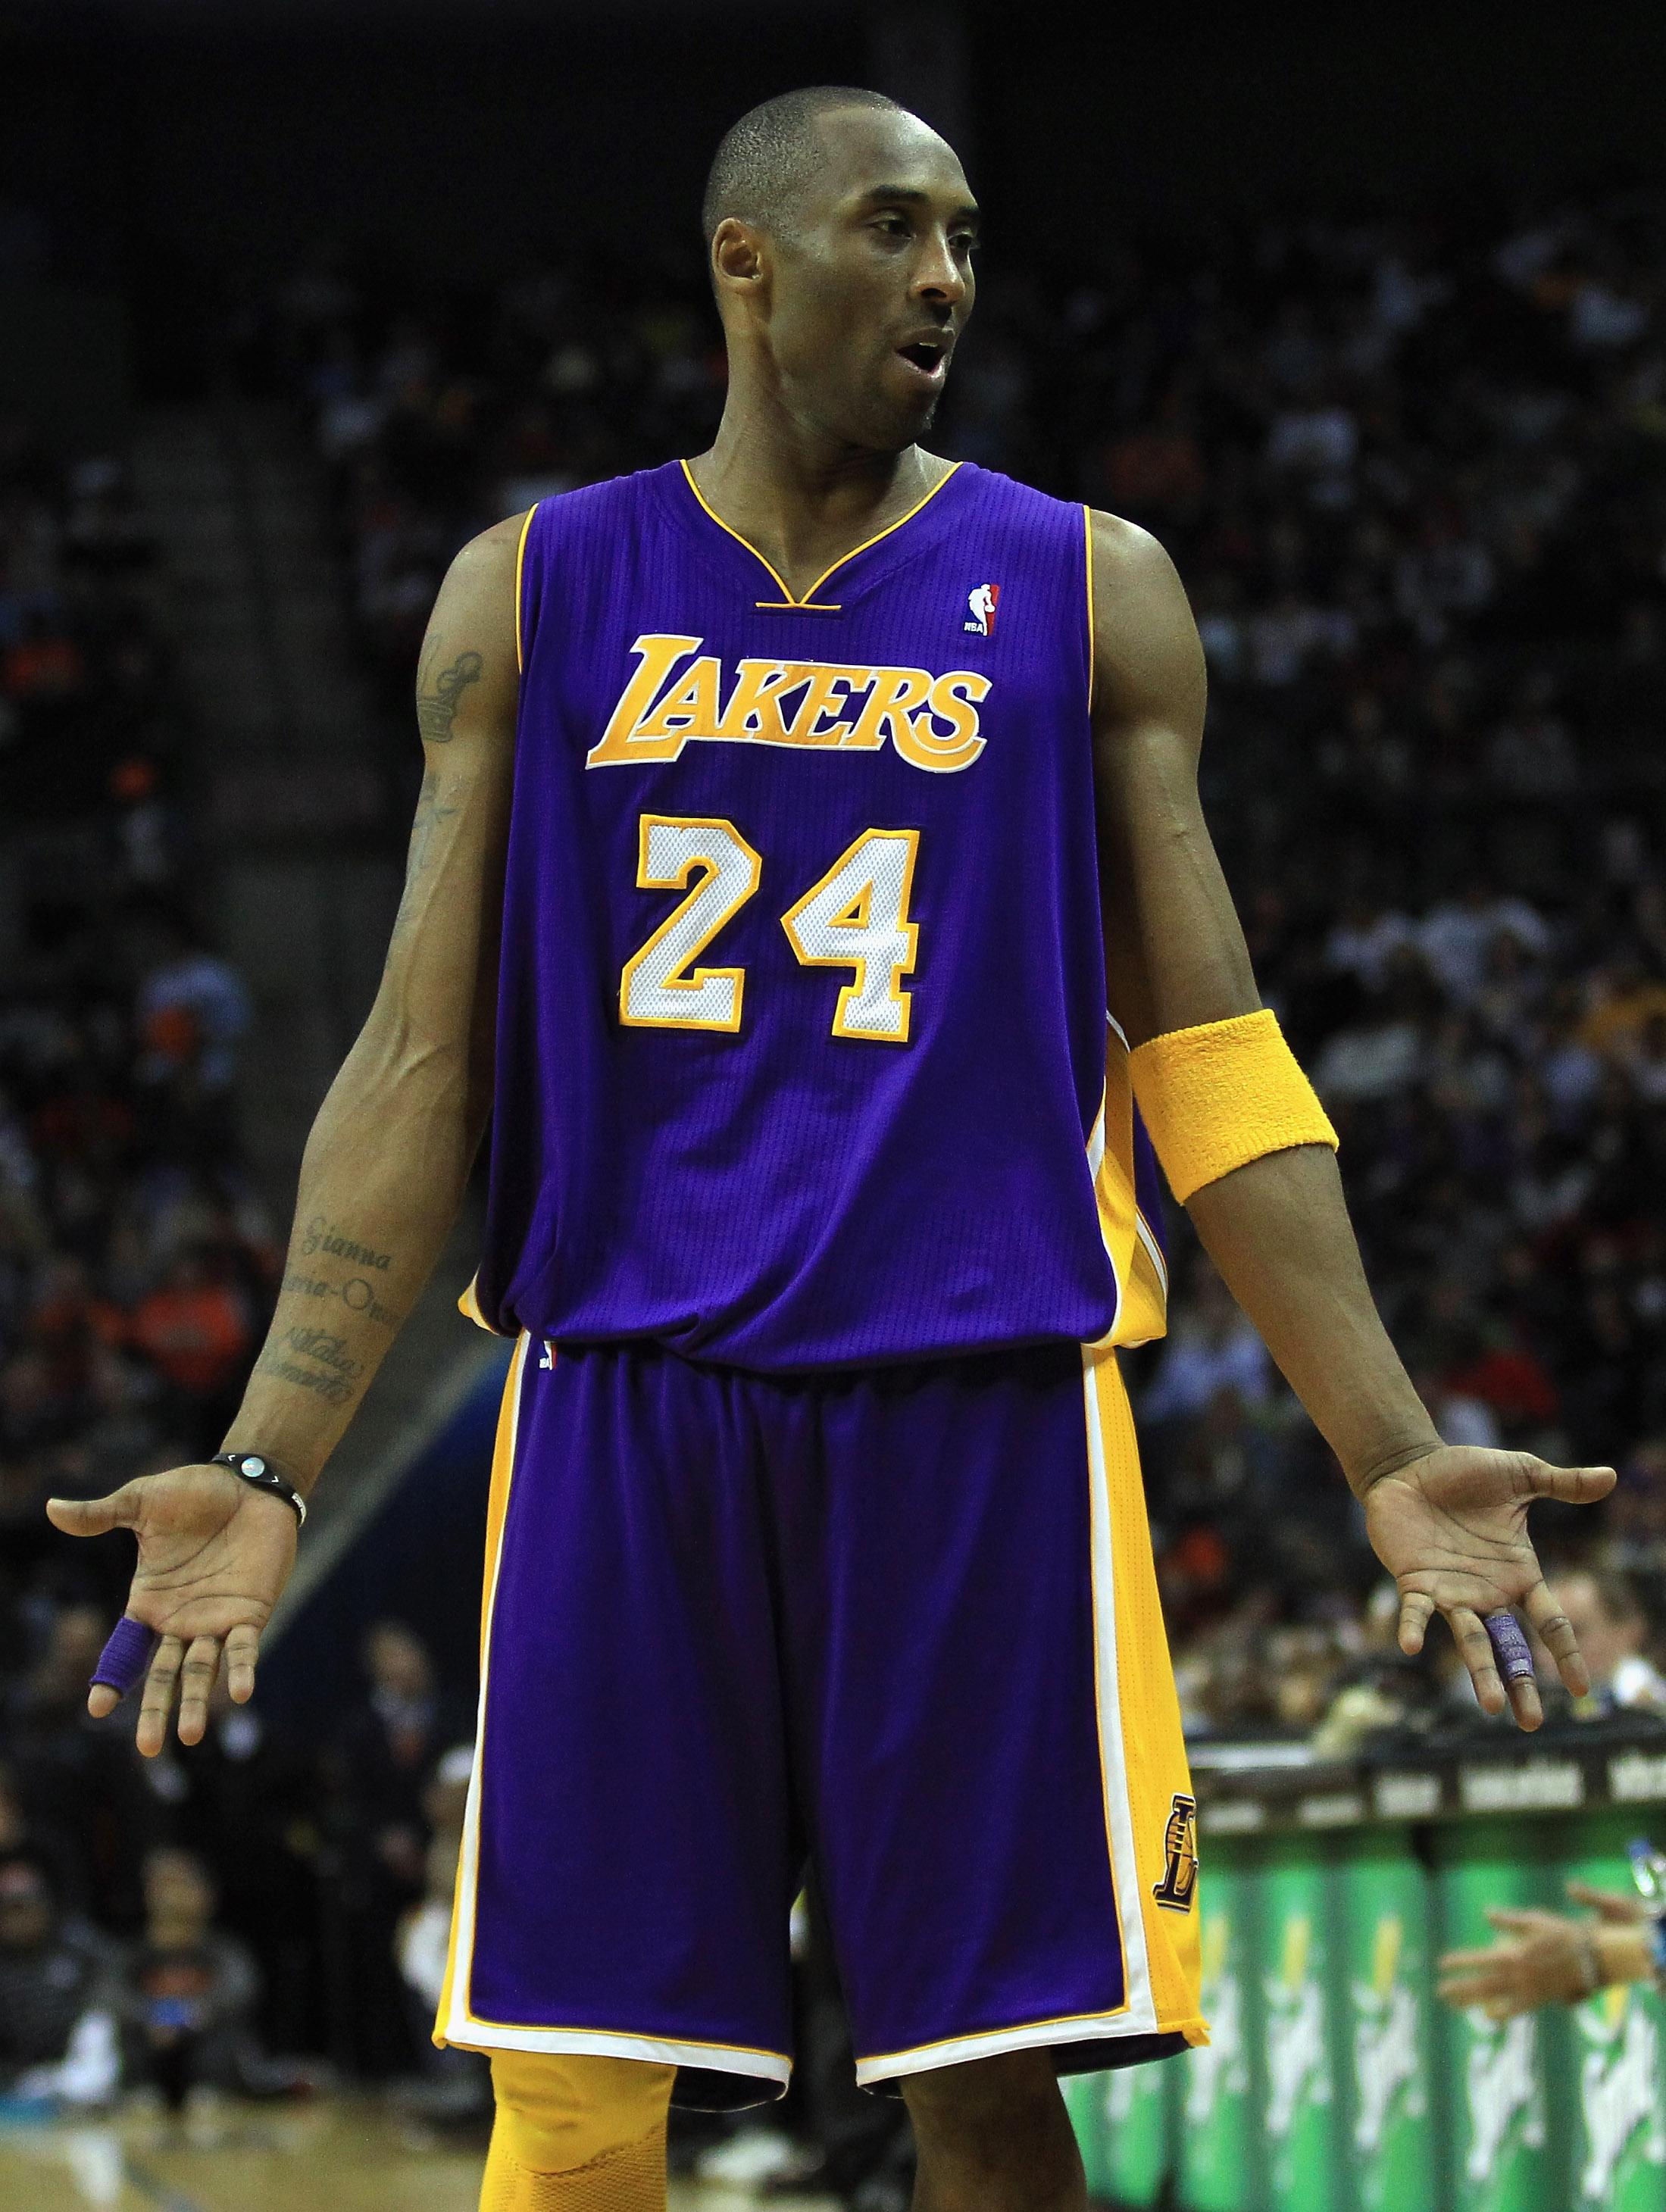 Los Angeles SG Kobe Bryant